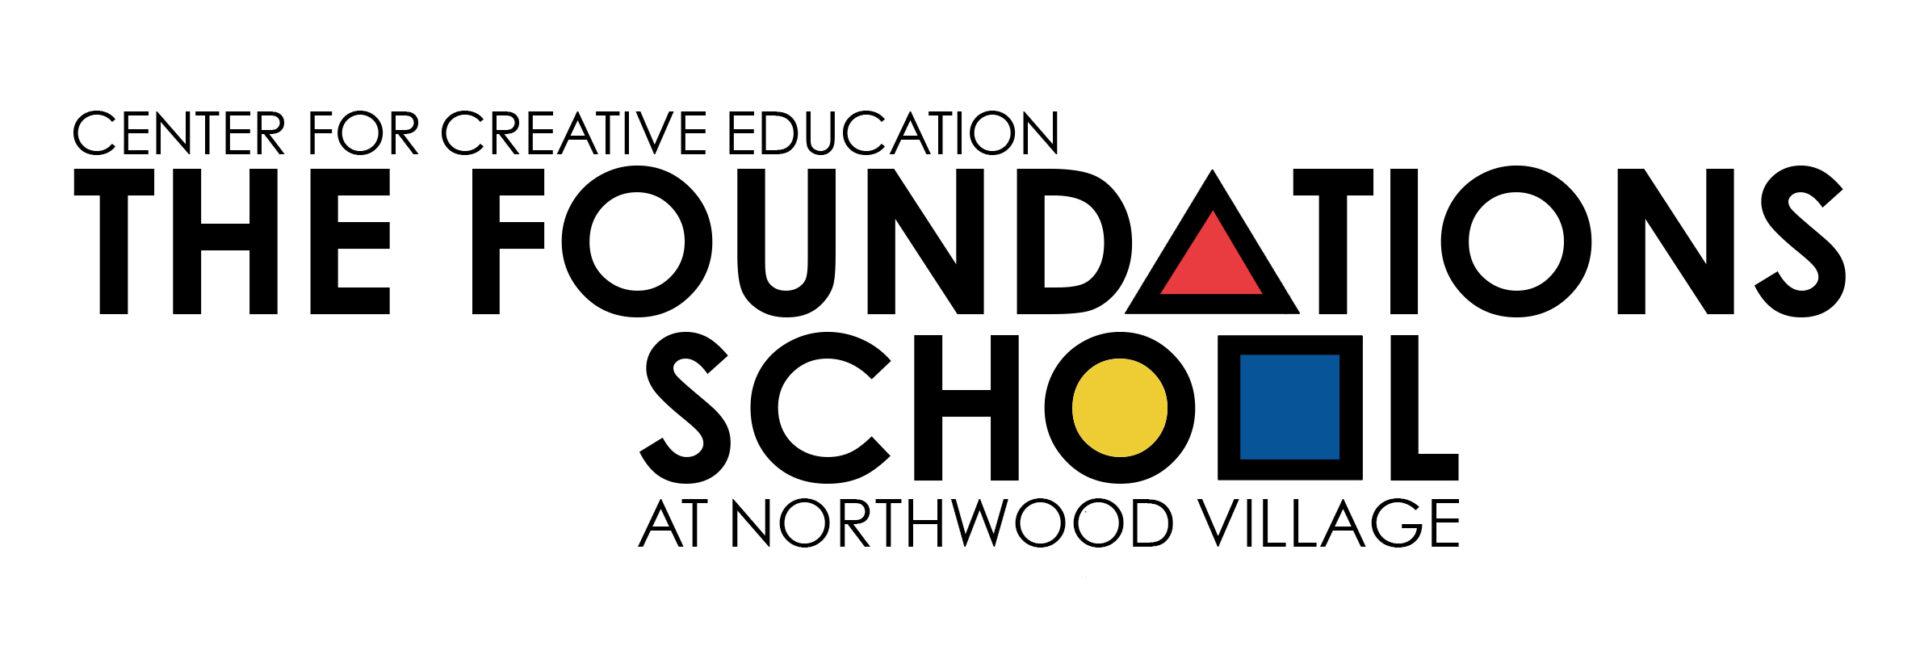 TheFoundationsSchool_Logo_FINAL